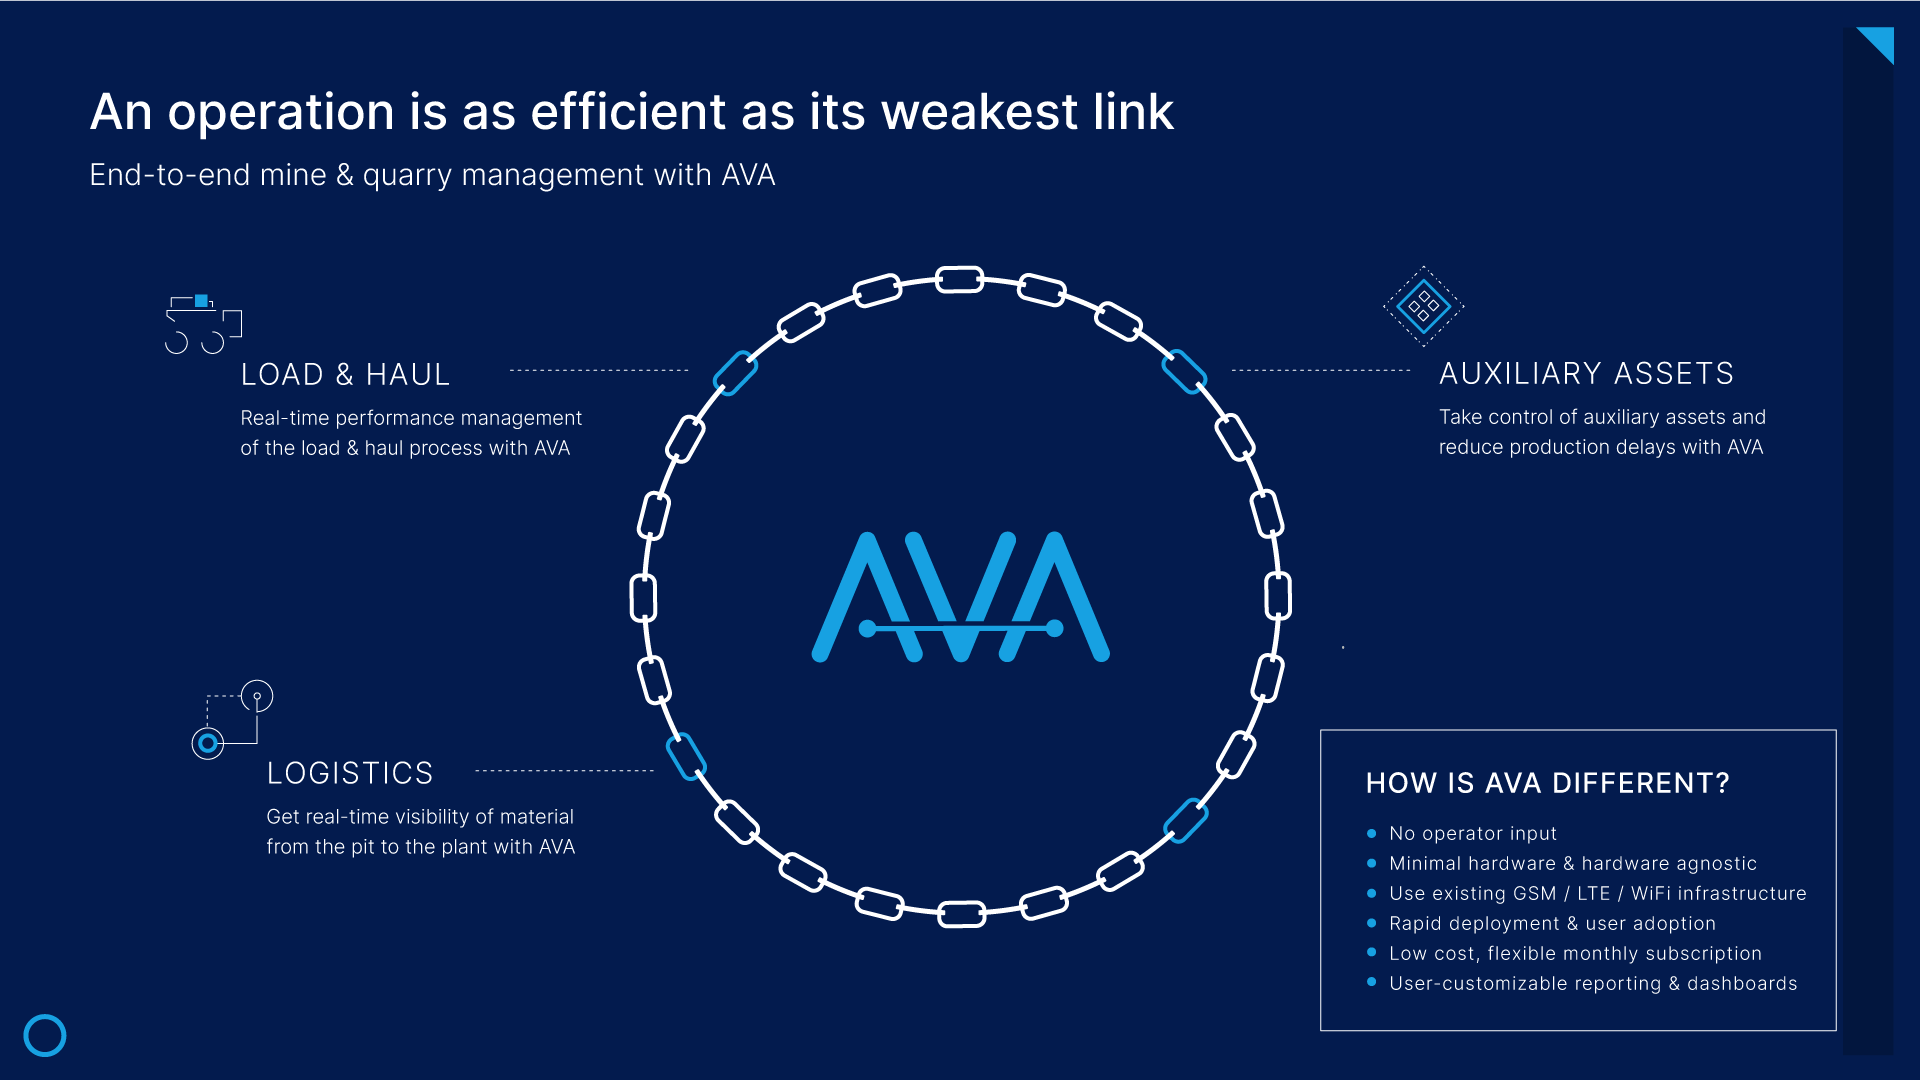 AVA-Auxiliary-Fleet